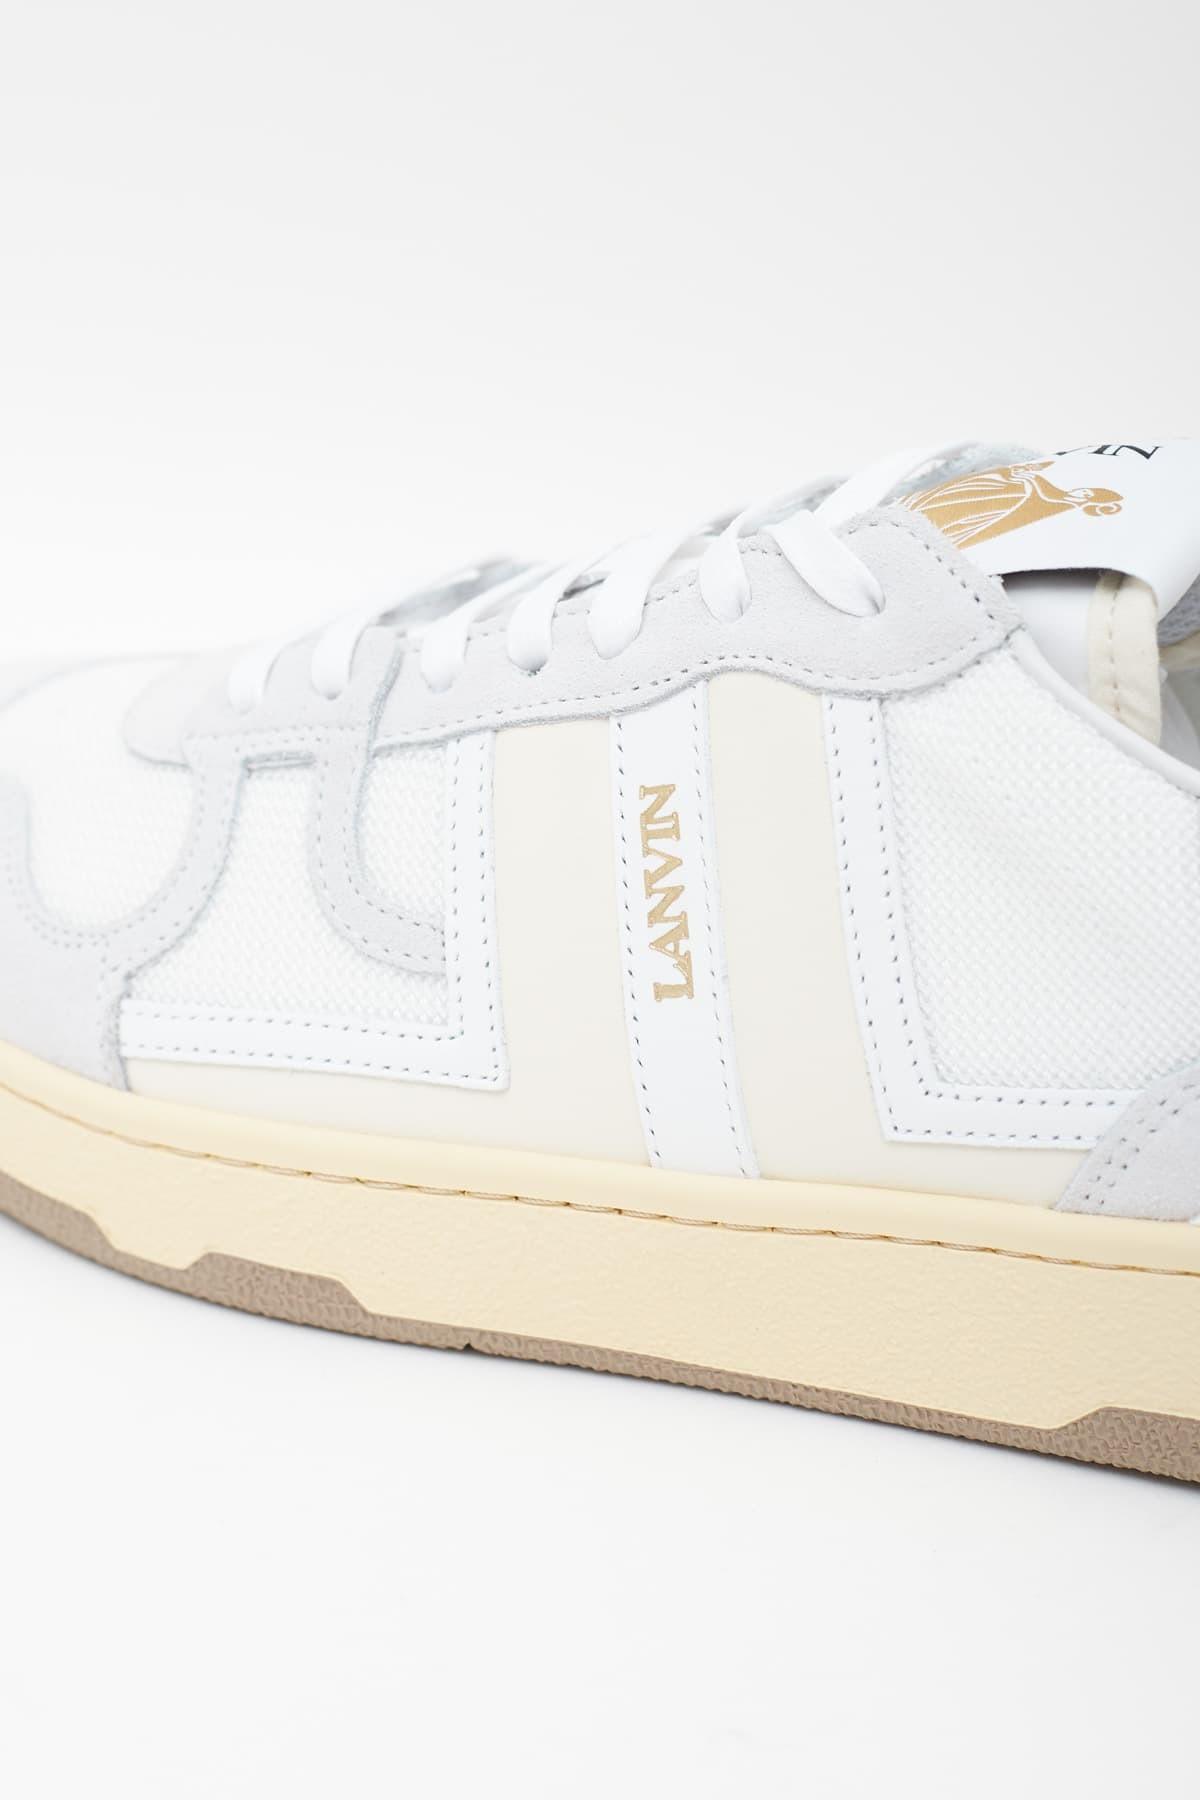 Shop Carhartt Wip Black Mosby Script T-Shirt